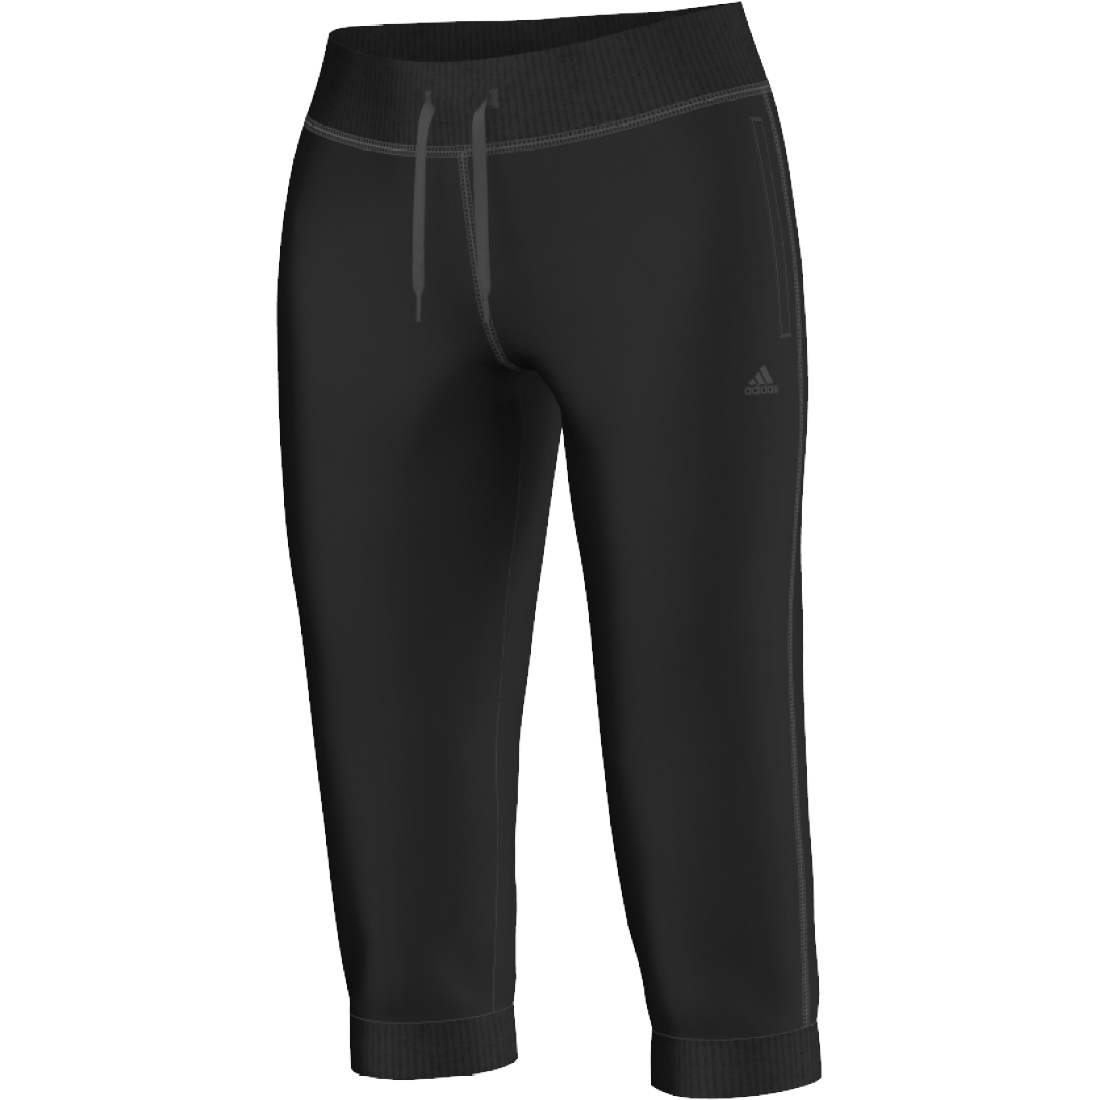 Image of   Adidas Essentials 3/4 Pant